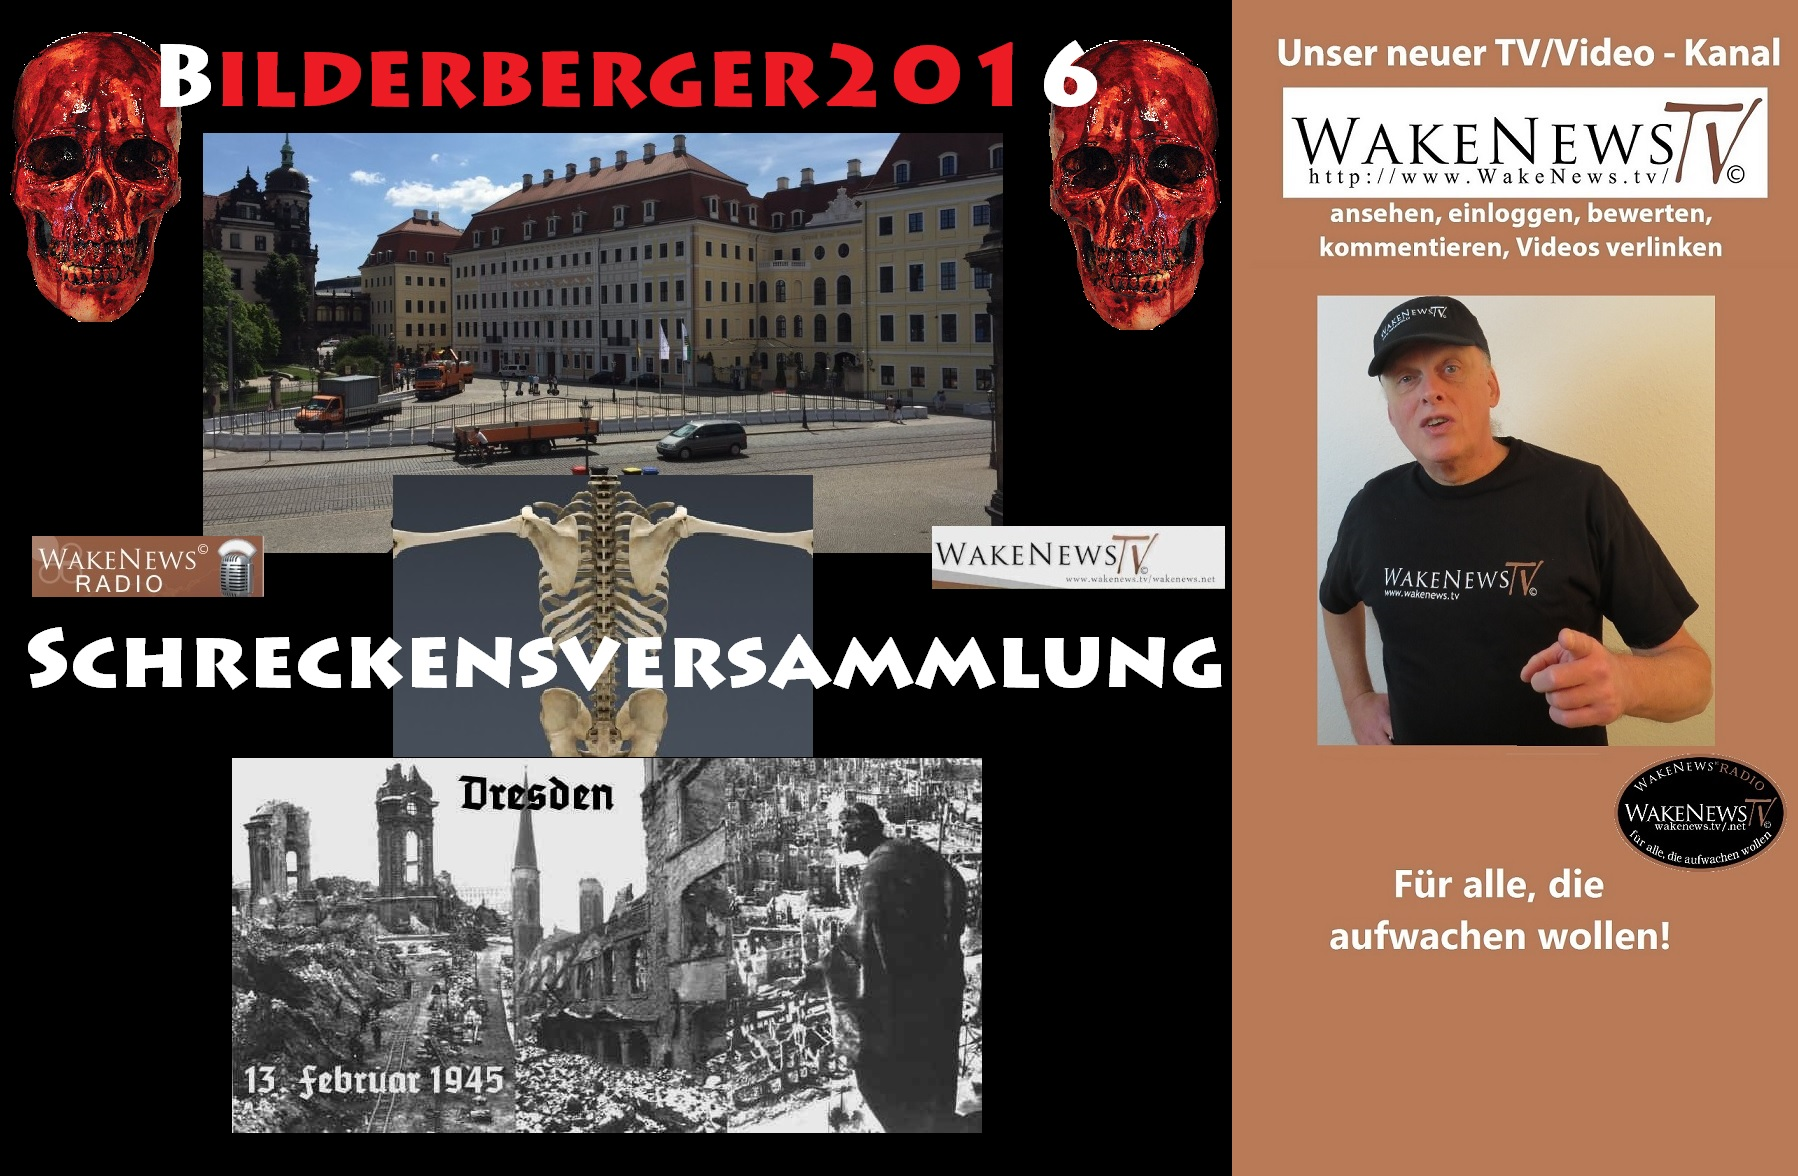 Bilderberger Schreckensversammlung 2016